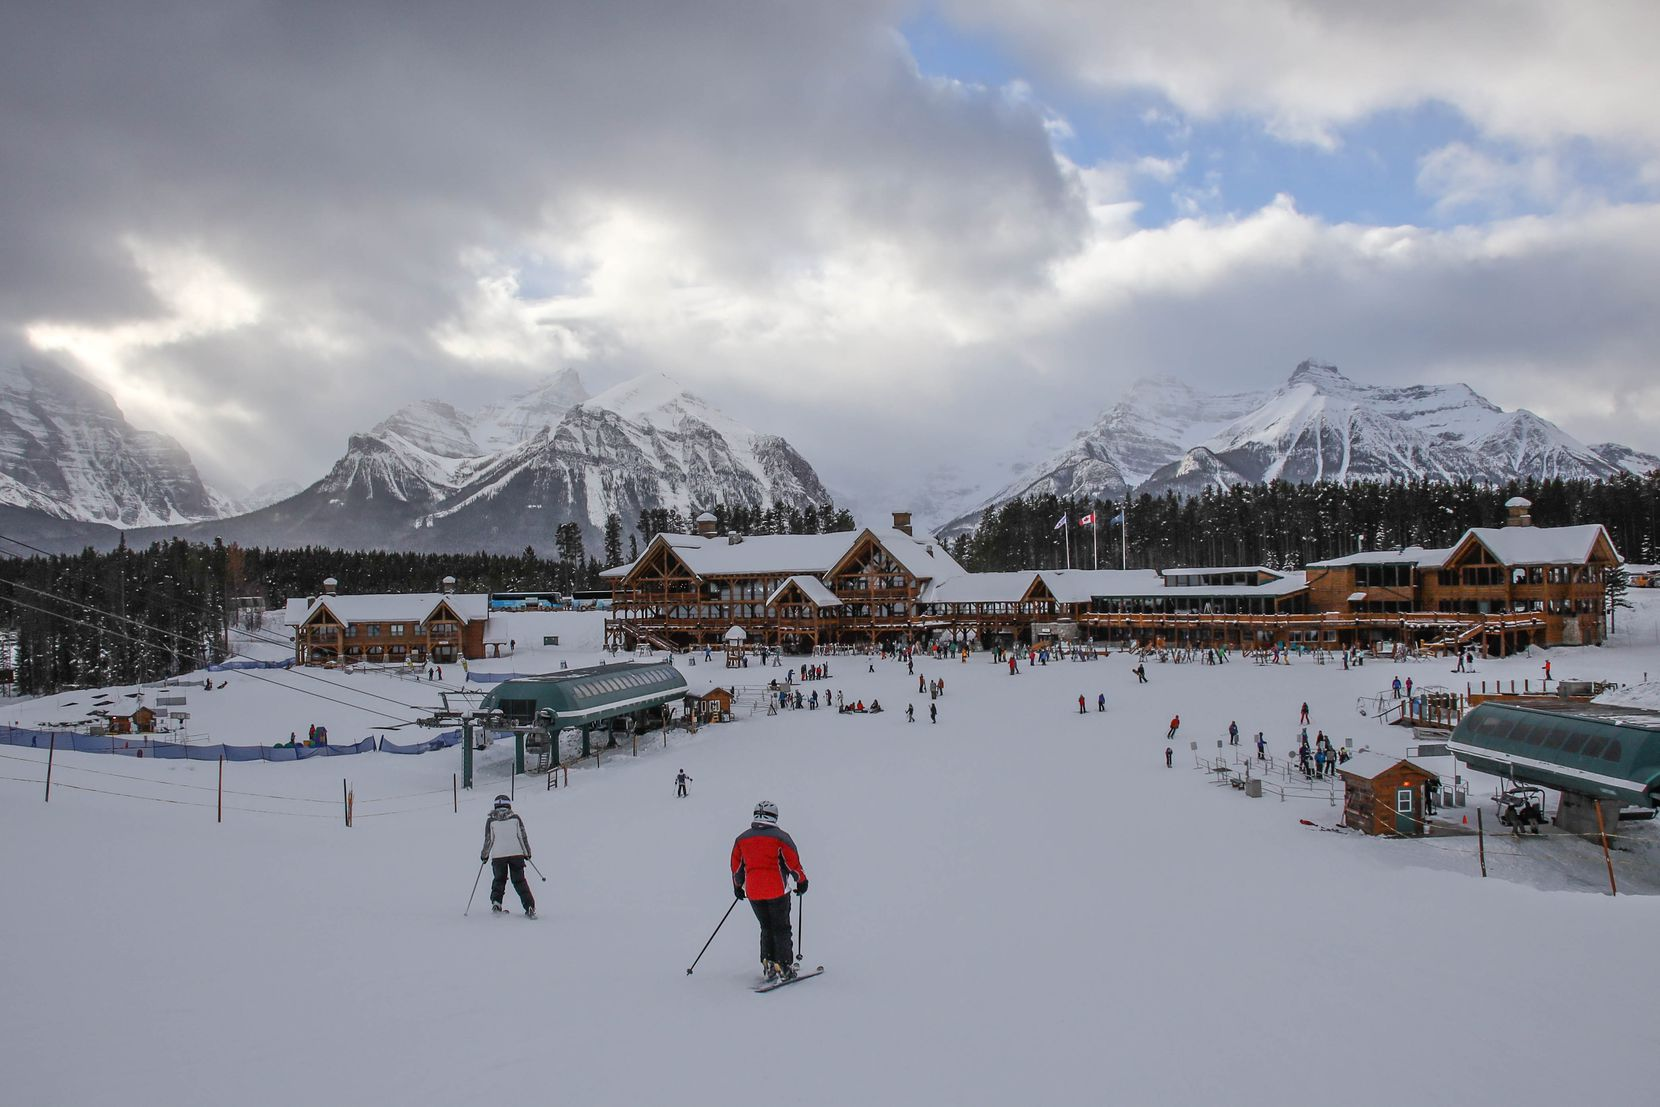 Lake Louise Ski Resort is one of three major ski resorts in Banff National Park.